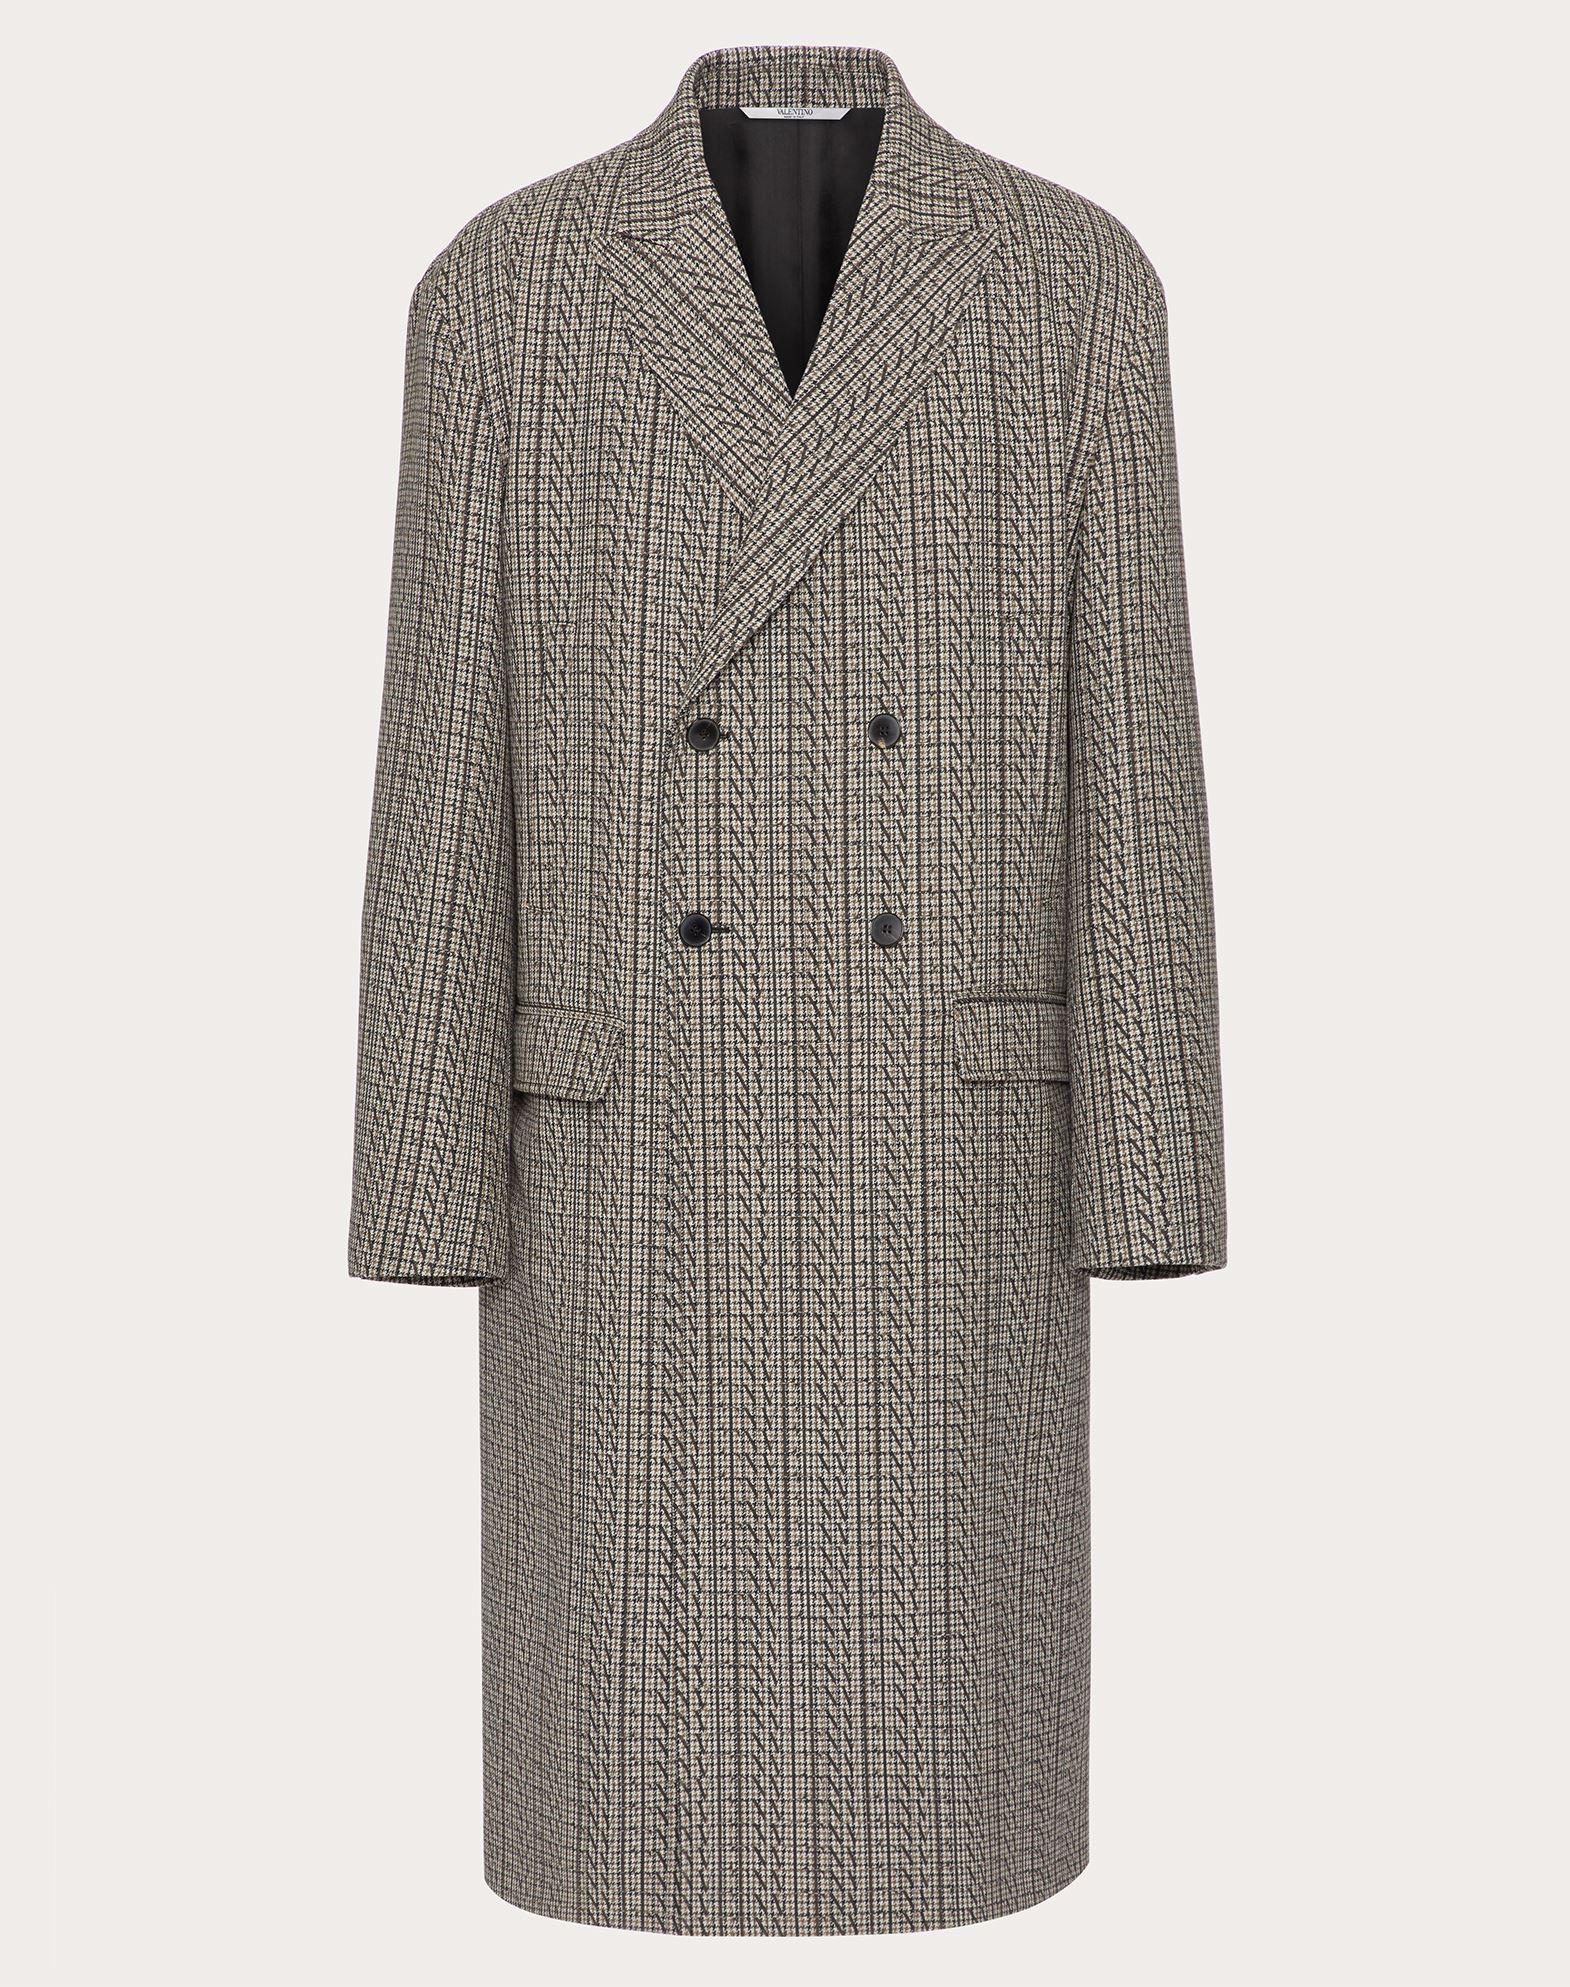 Valentino Uomo Vltn Times Wool Coat In Grau